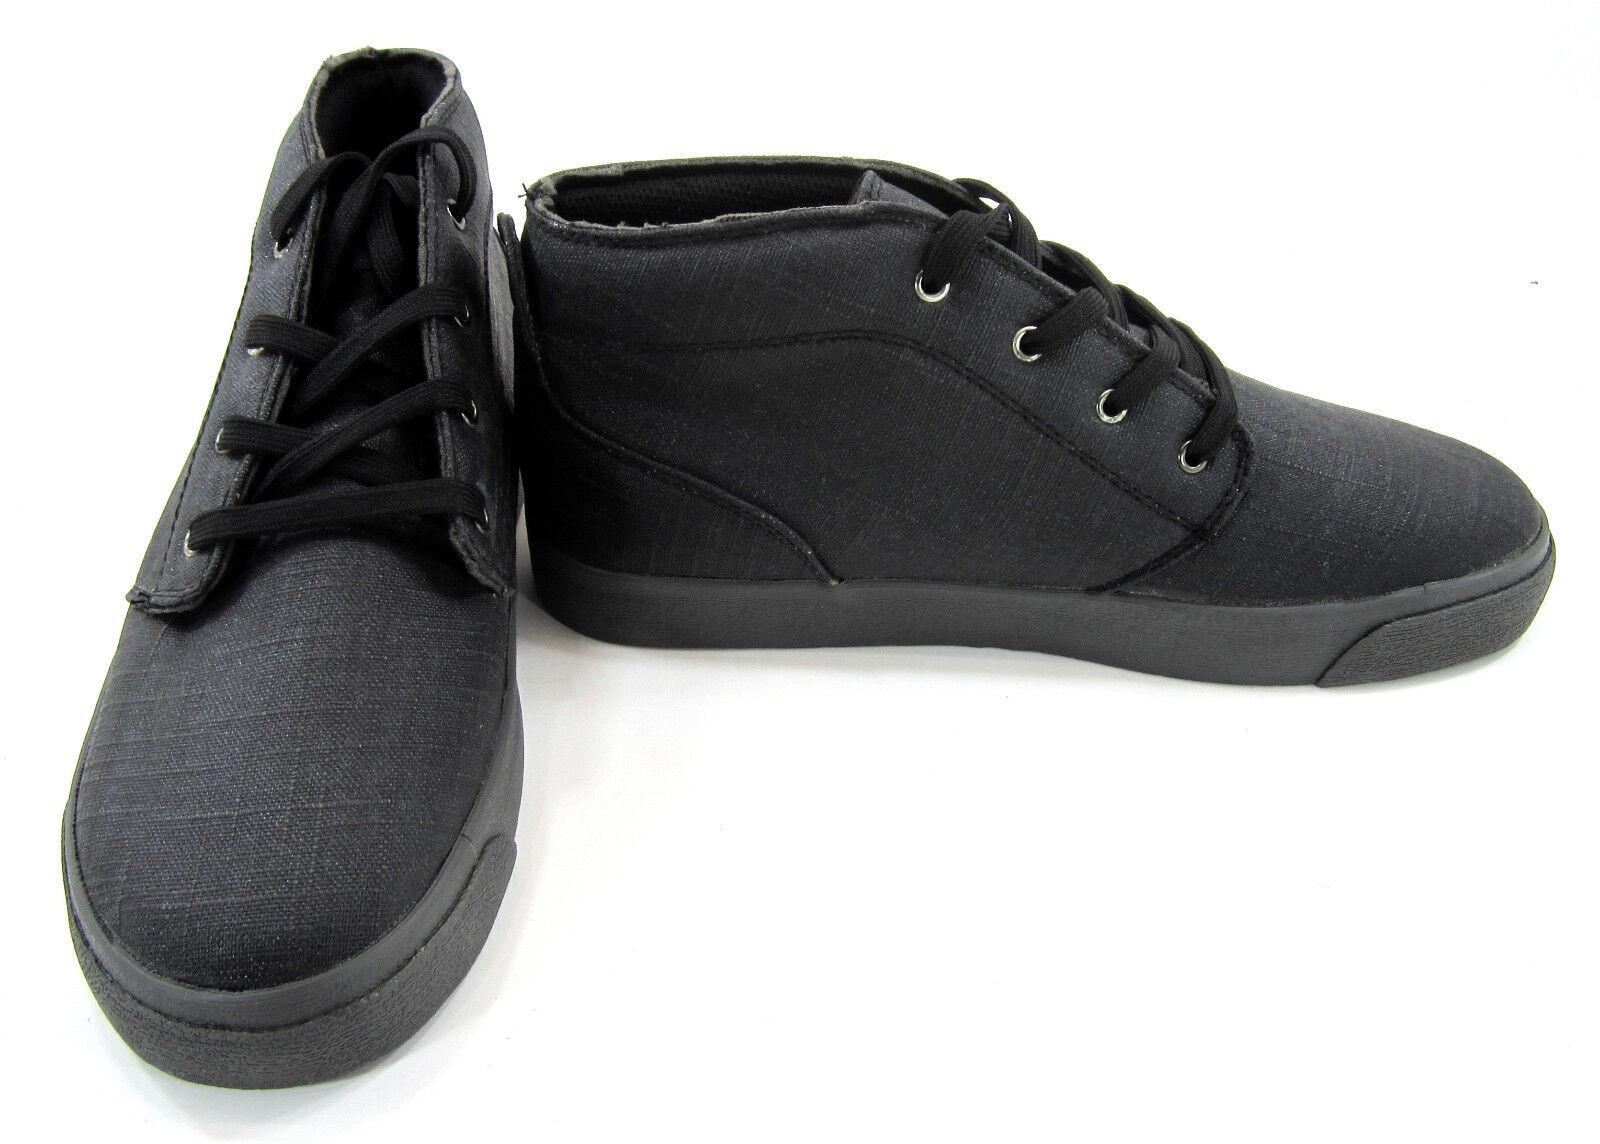 Lugz botas Rodillo mediados lienzo recubierto Negro Carbón Zapatos